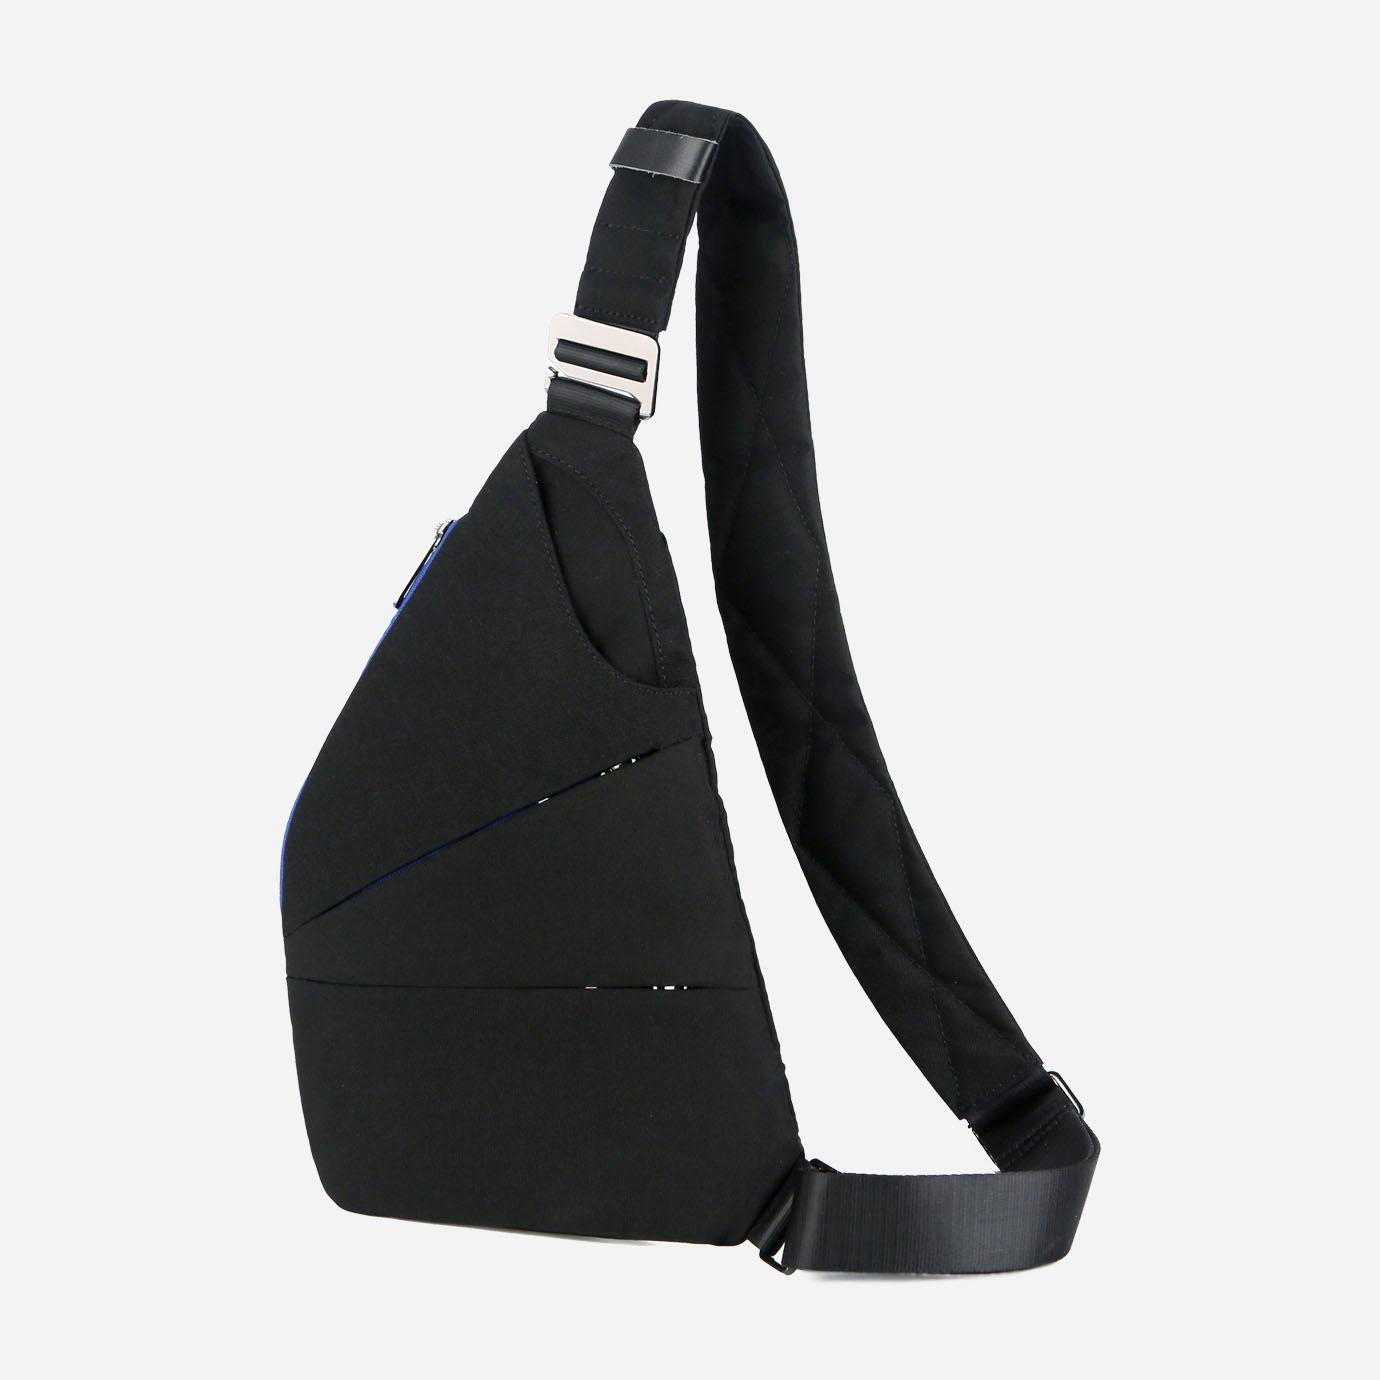 Nordace Duncan - Daily Sling Bag